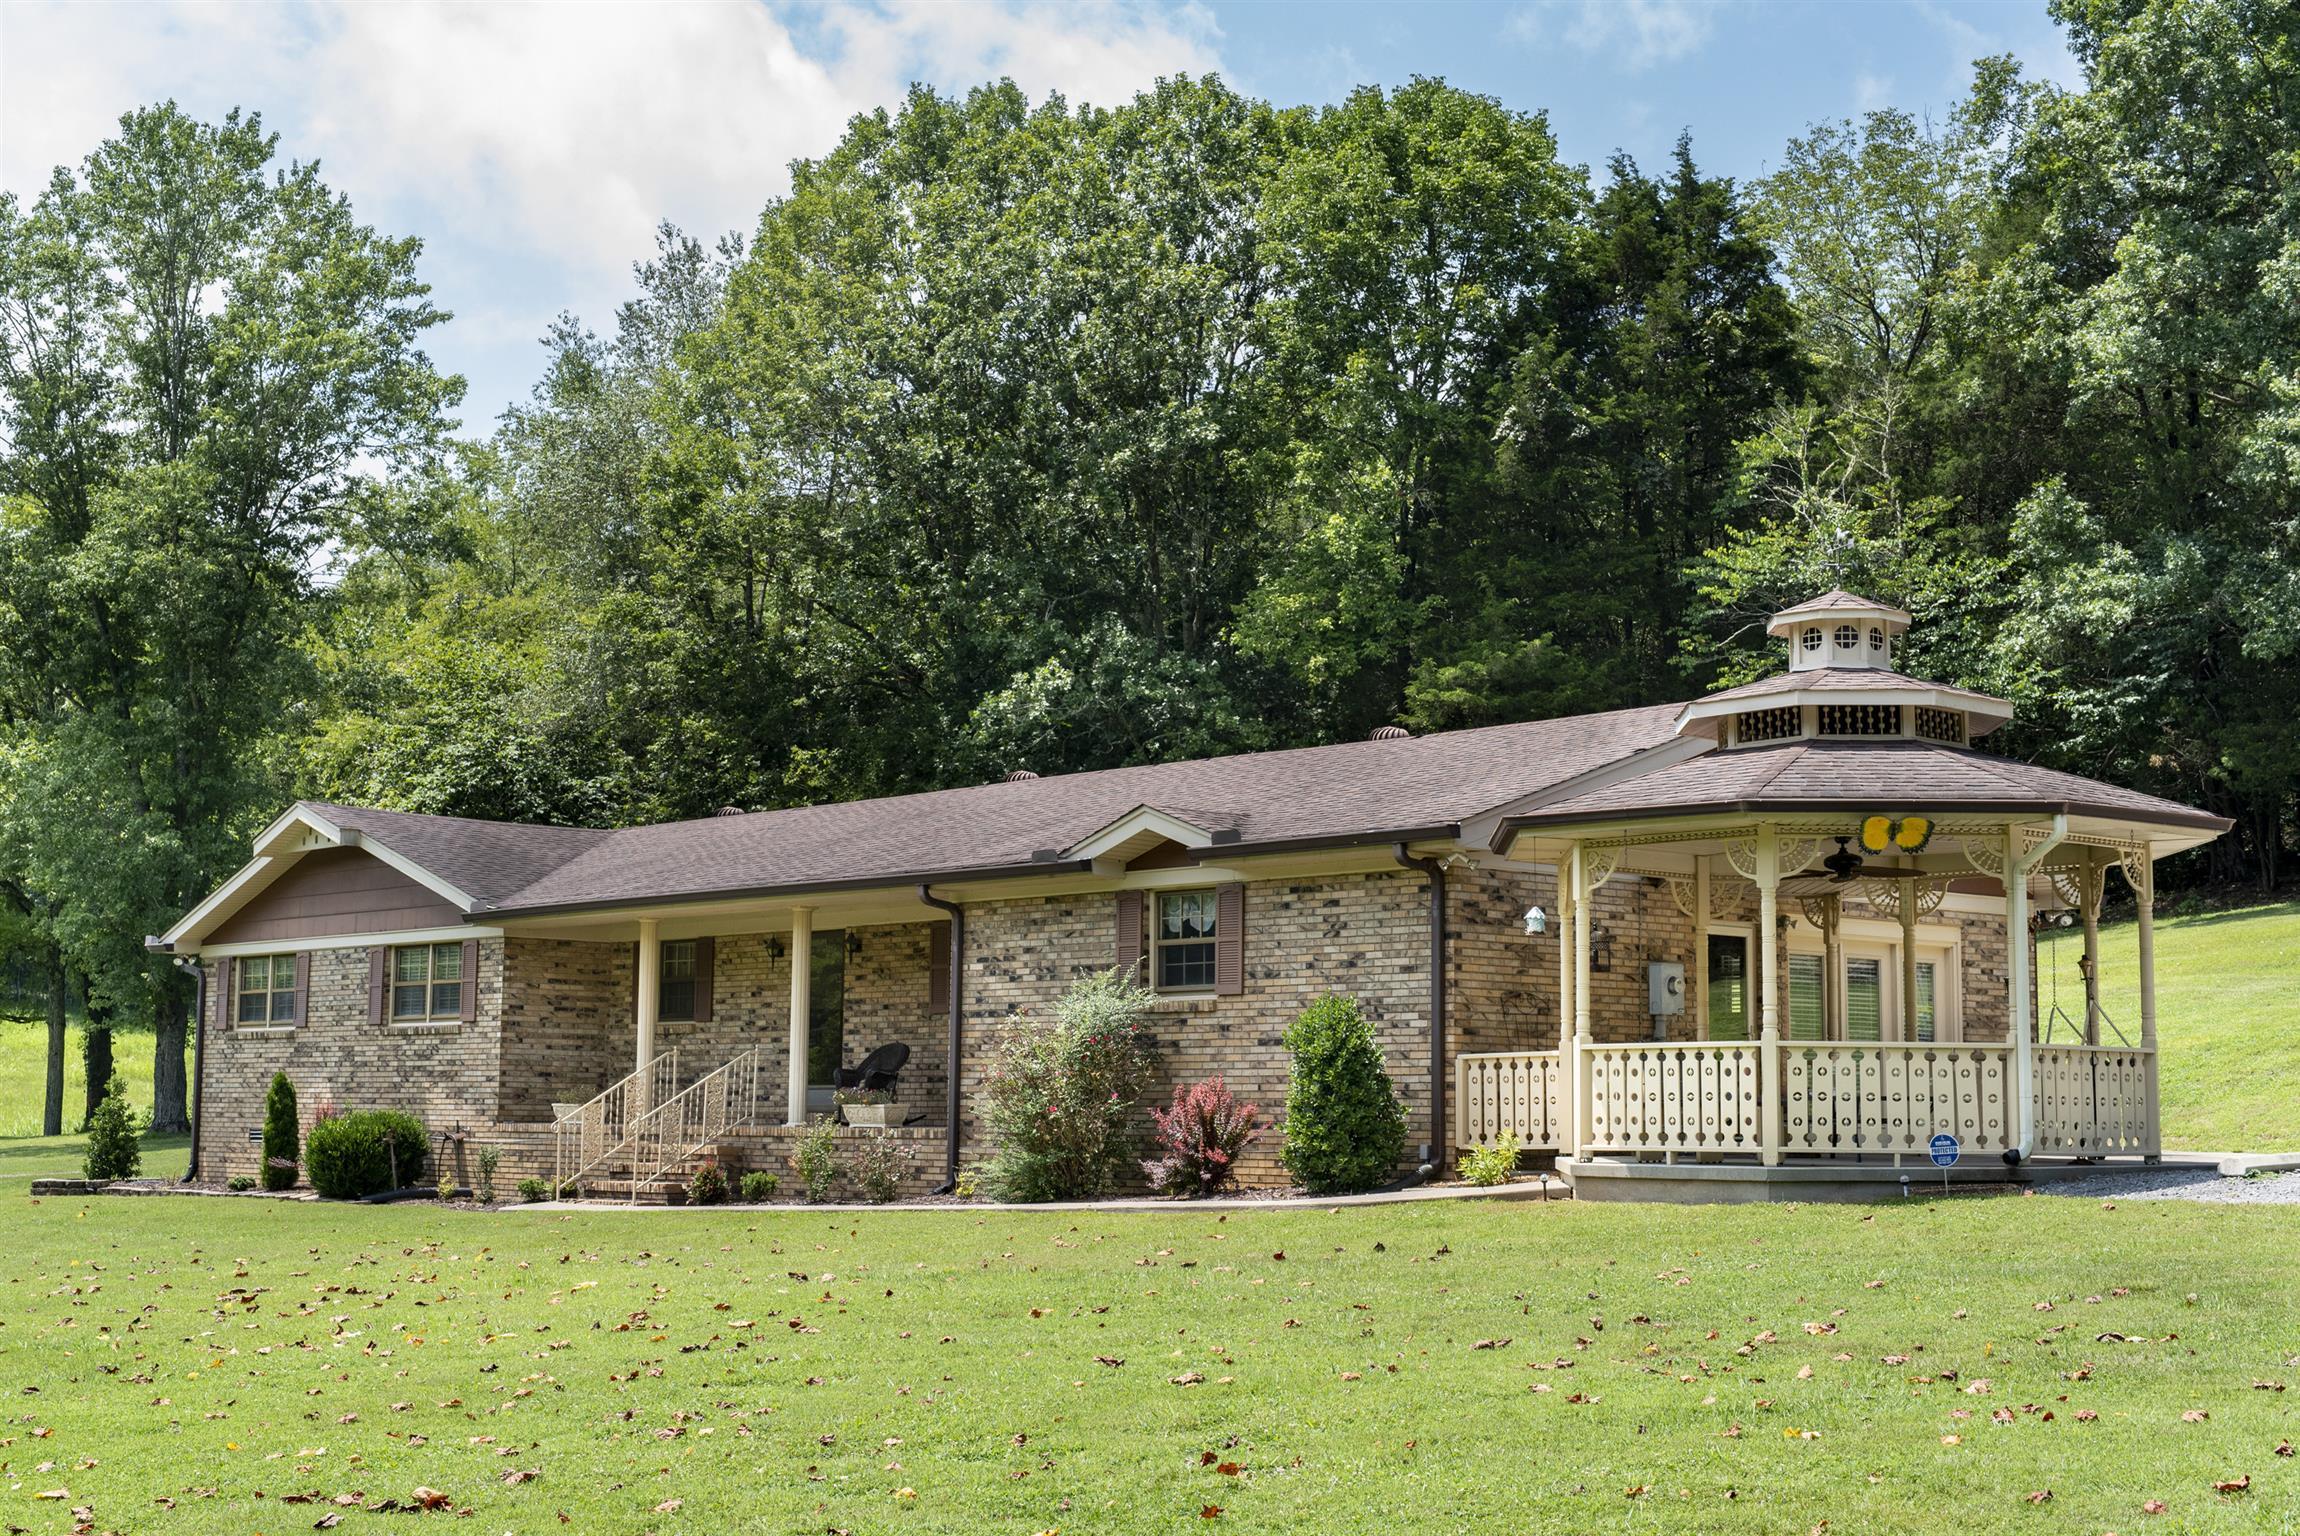 90 E Buffalo Rd, Pleasant Shade, TN 37145 - Pleasant Shade, TN real estate listing